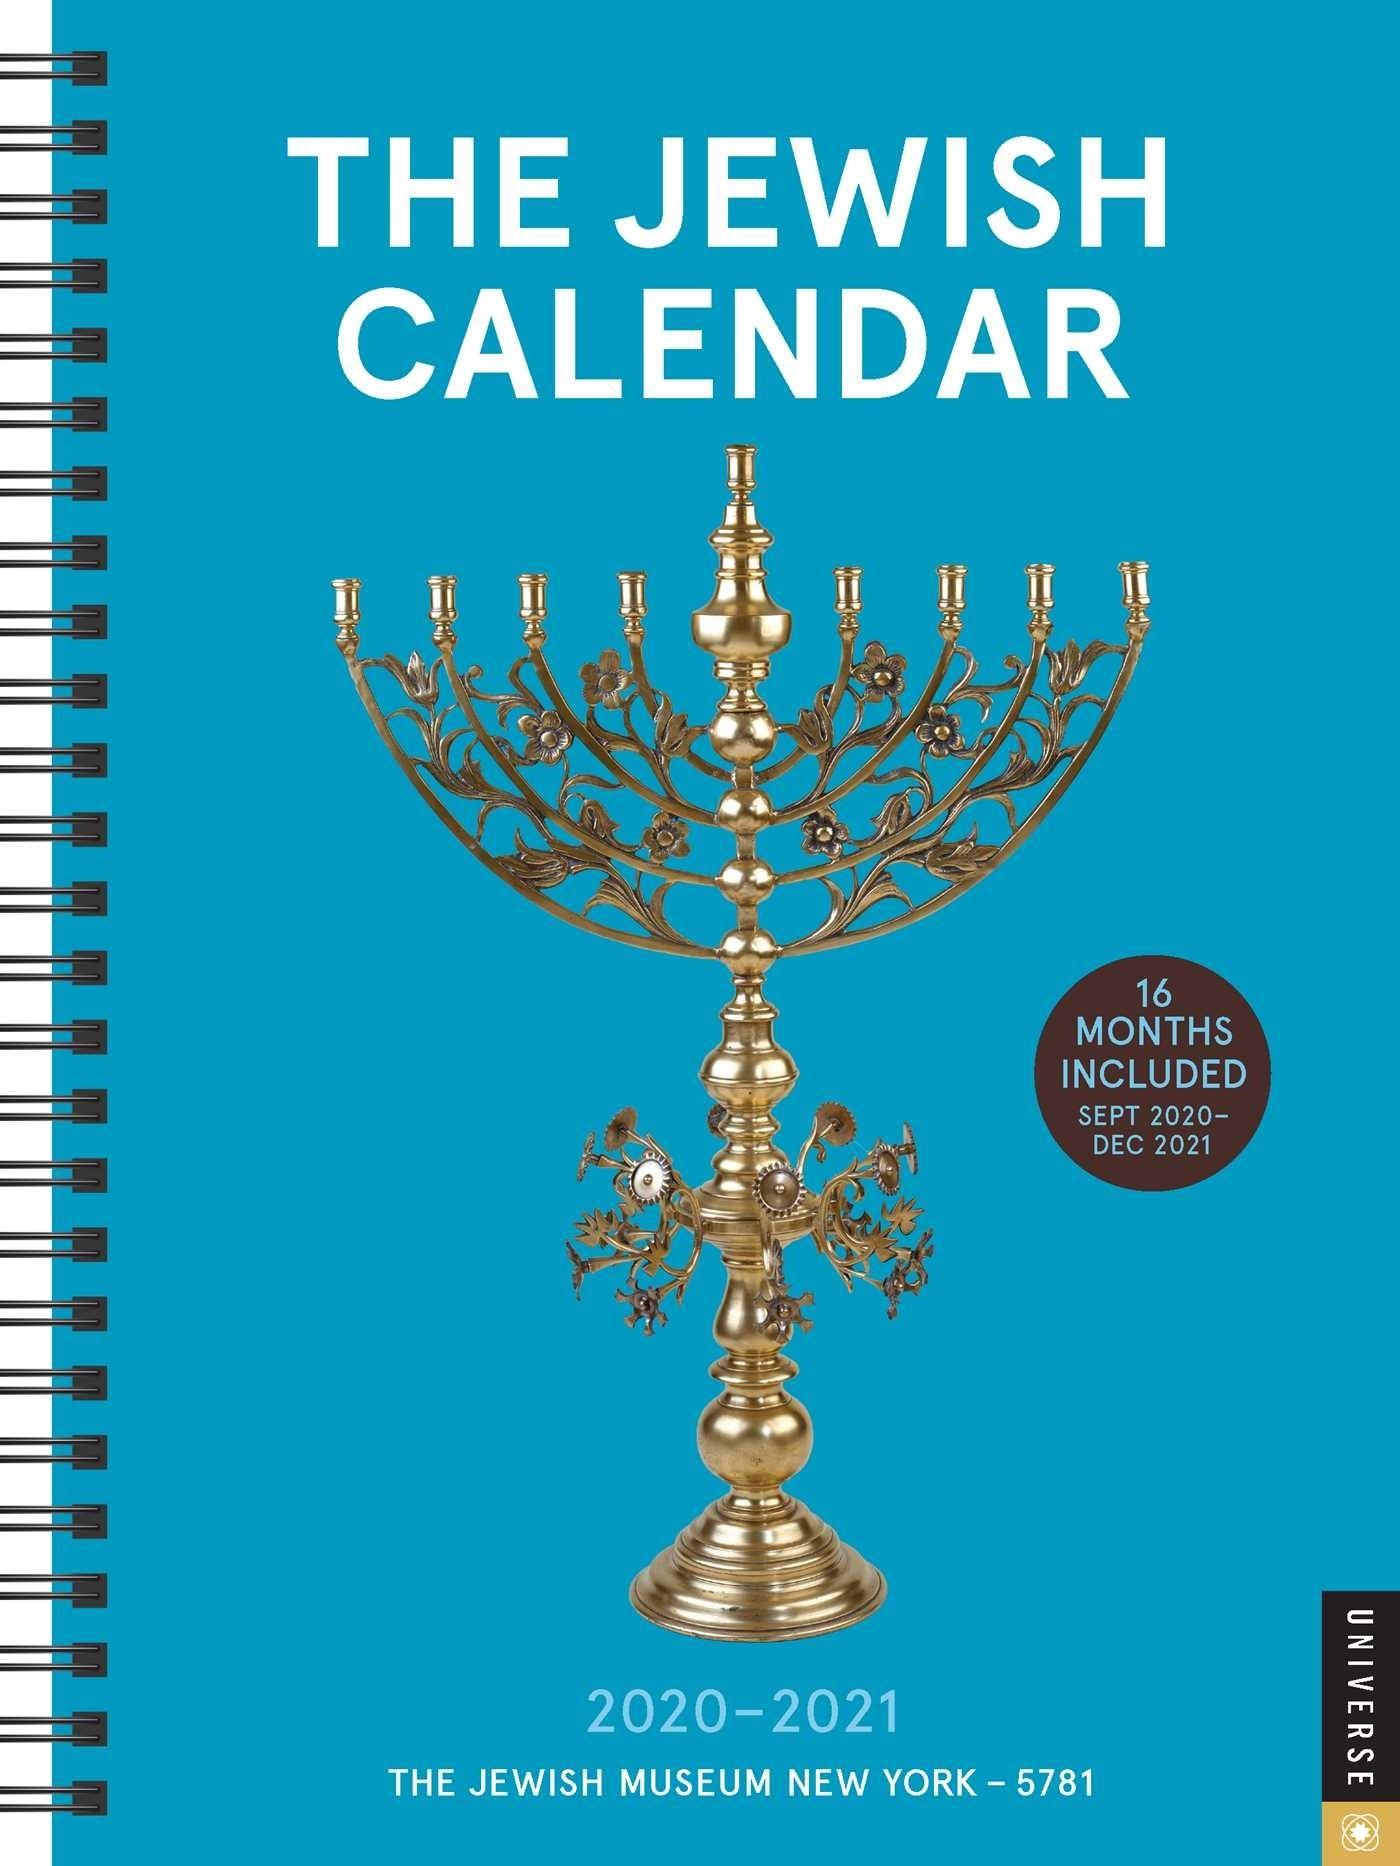 The Jewish Calendar 16-Month 2020-2021 Engagement Calendar-Jewish Calendar May 2021